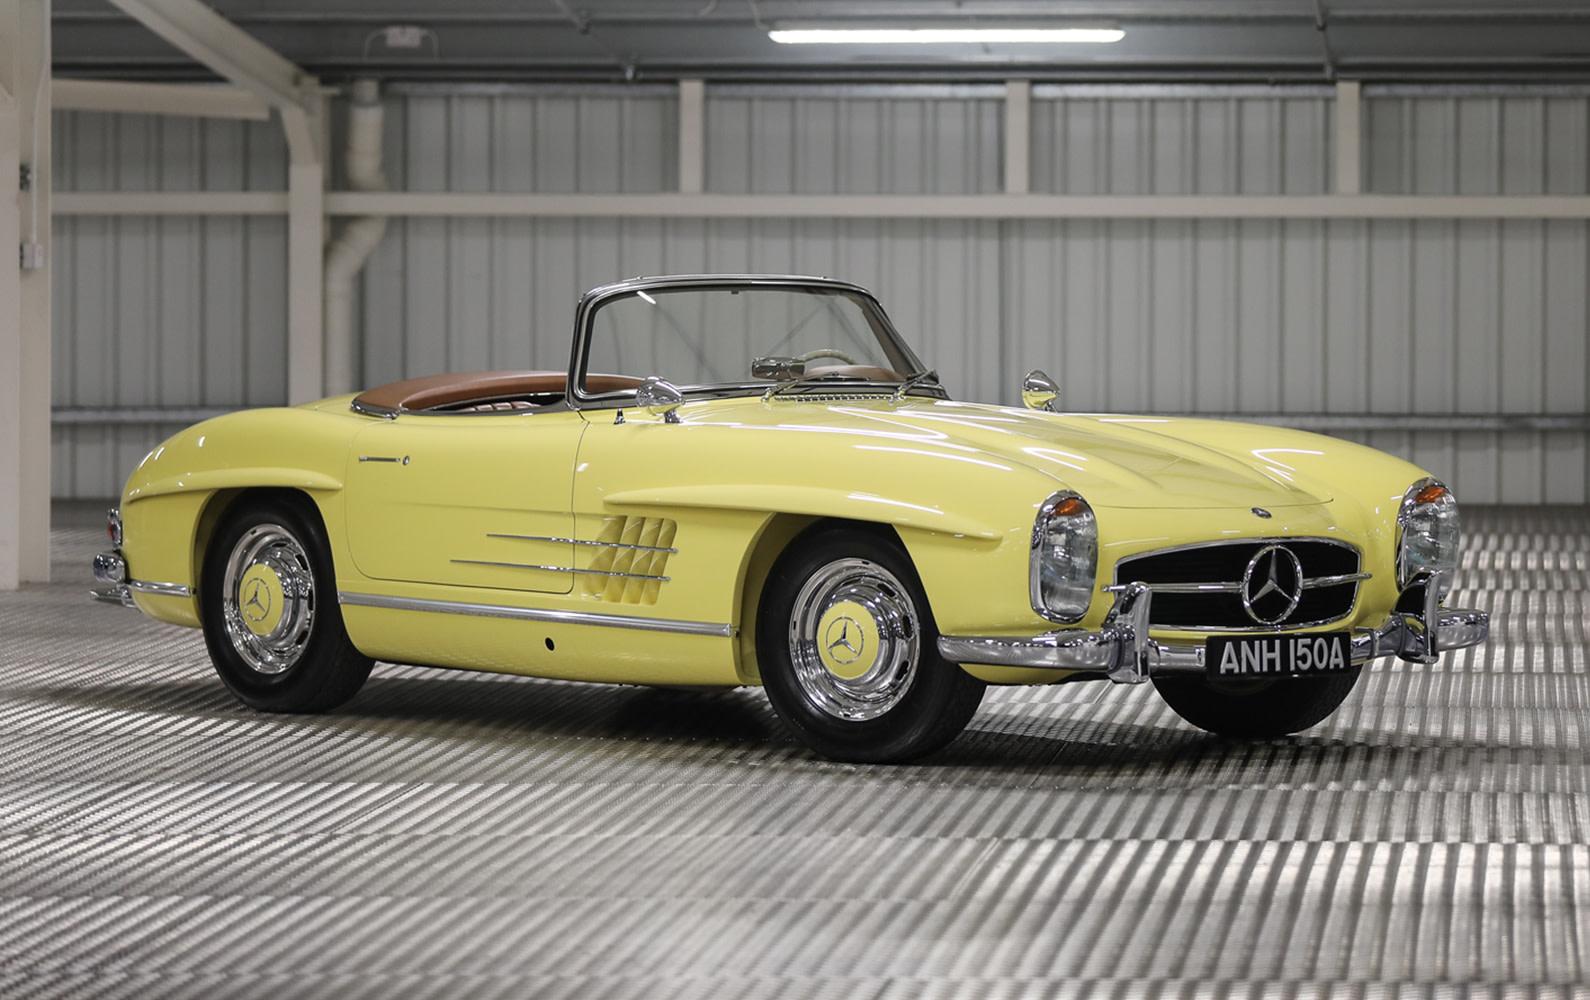 Prod/O21B - UK 2021/1963 Mercedes 300 SL Roadster/Mercedes_300_SL_Roadster-01_df2t16